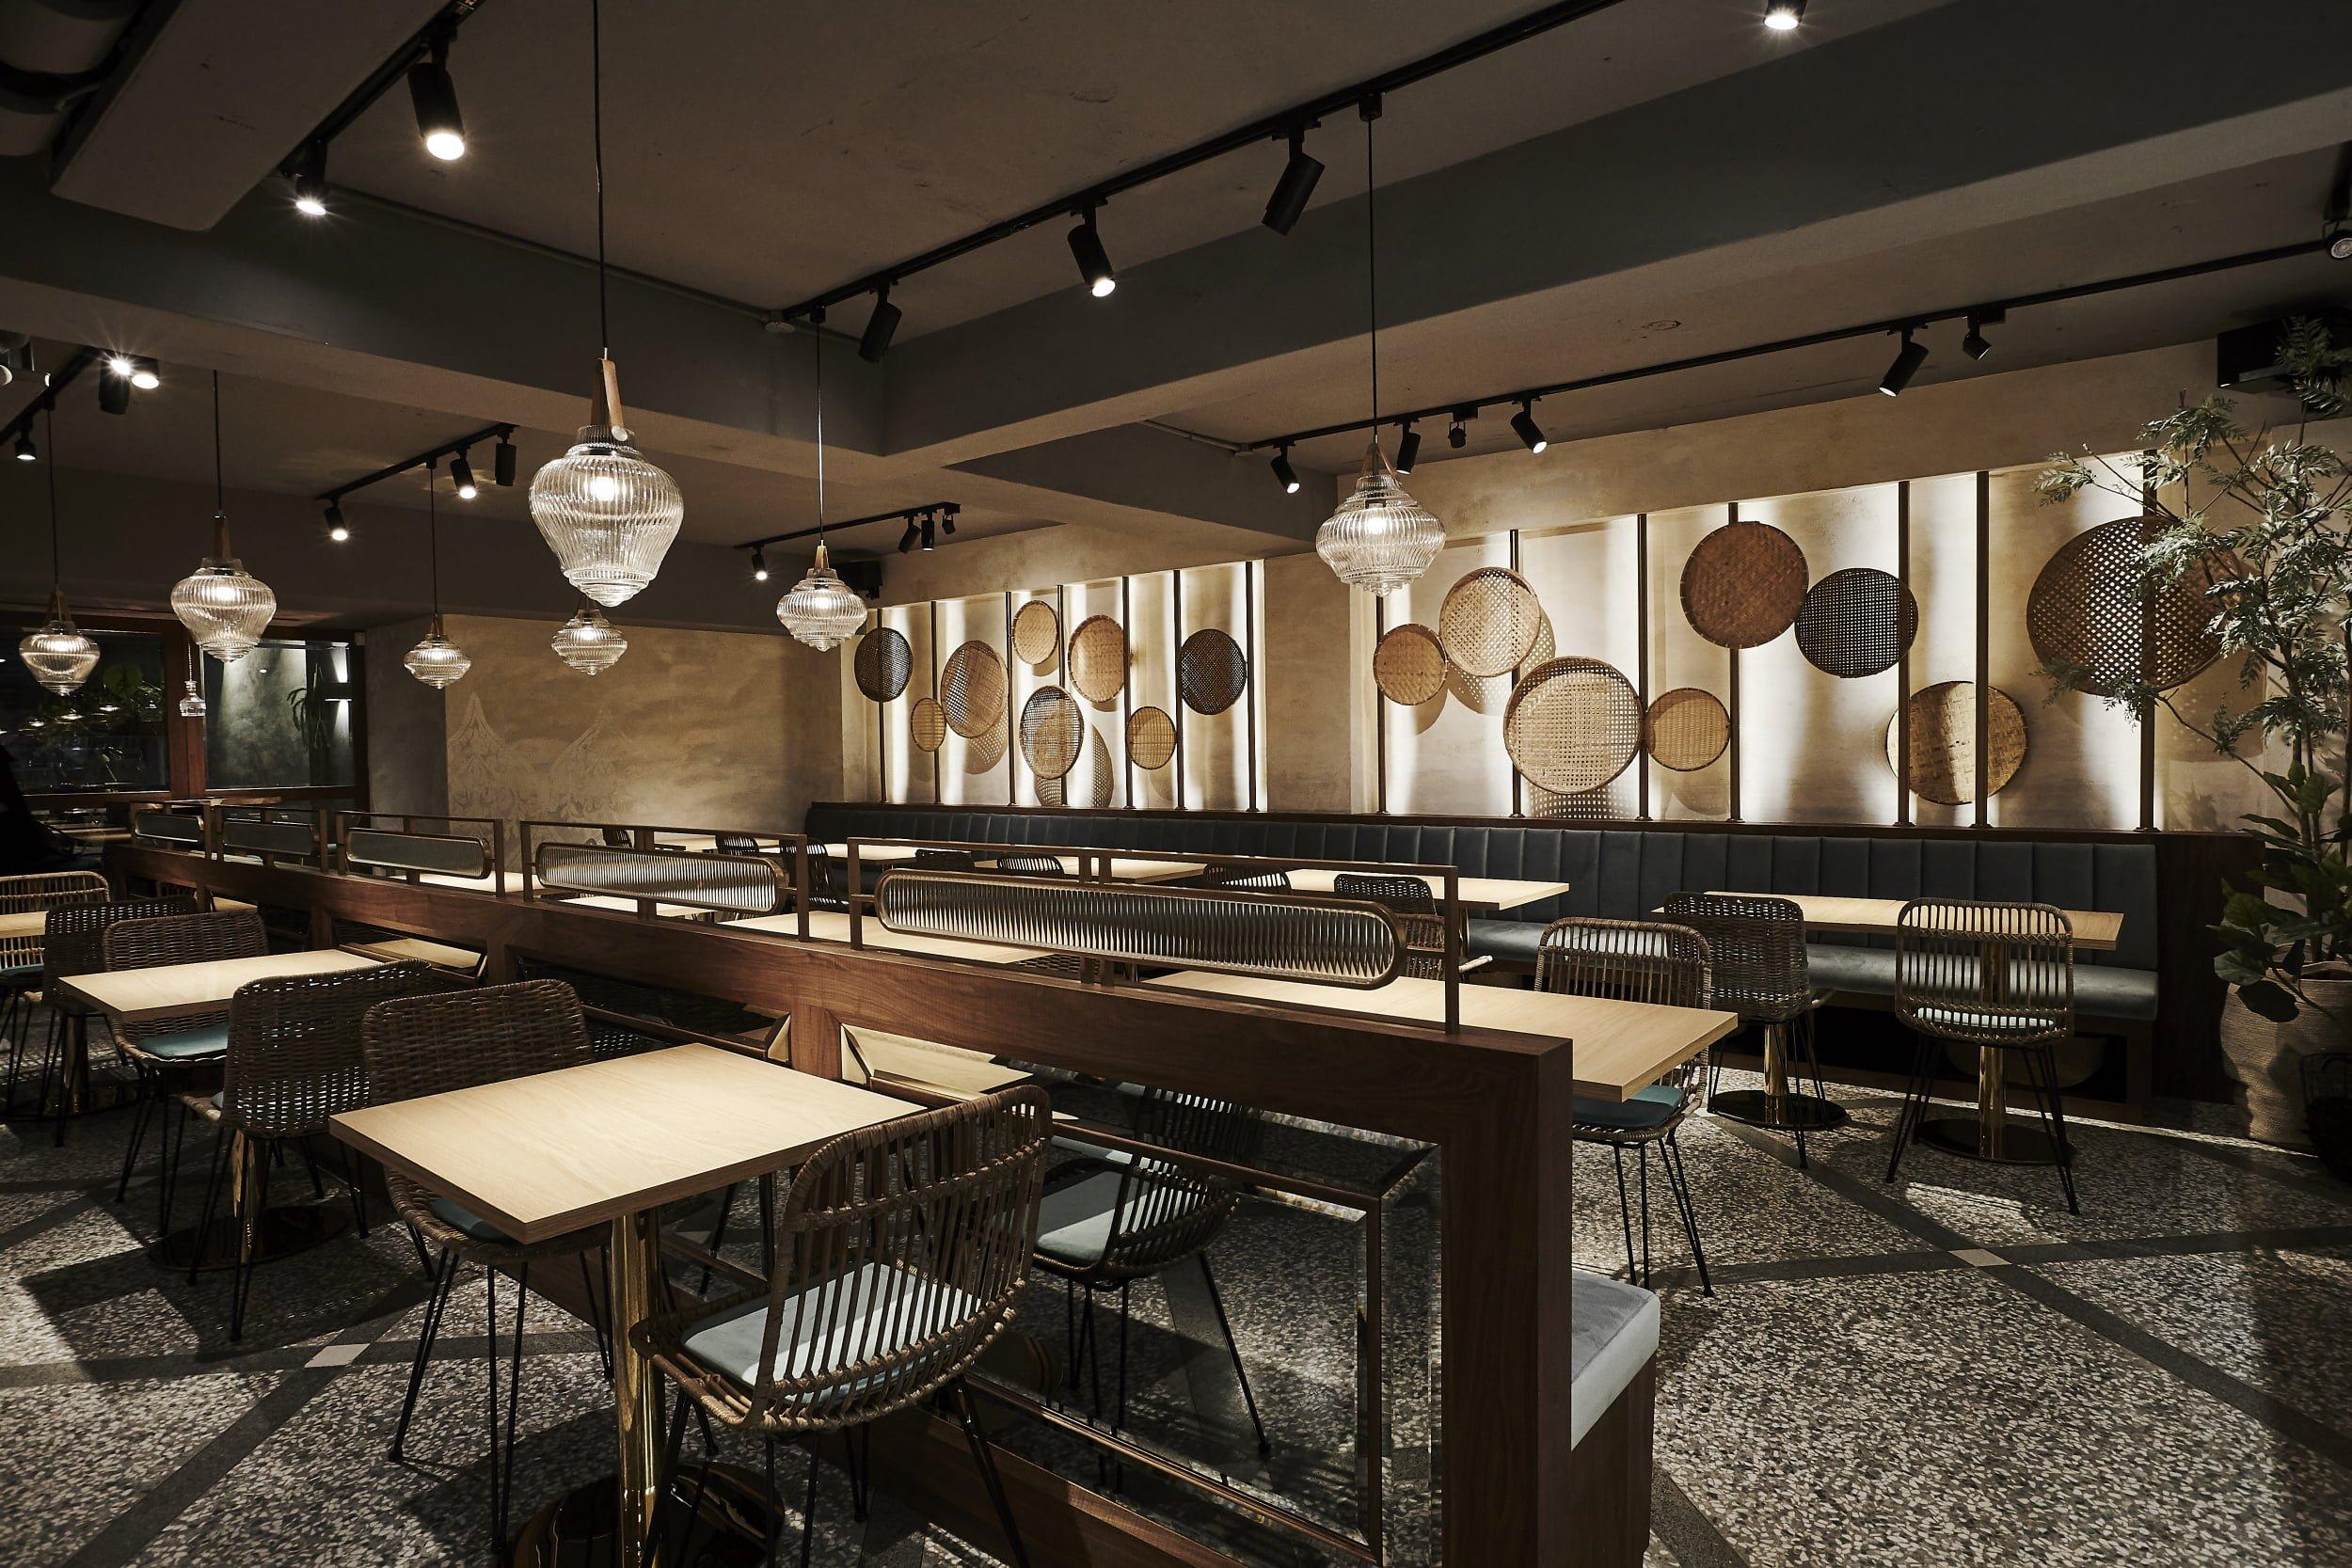 MMHG集團旗下泰式家庭料理餐廳 baan在疫情期間暫停內用